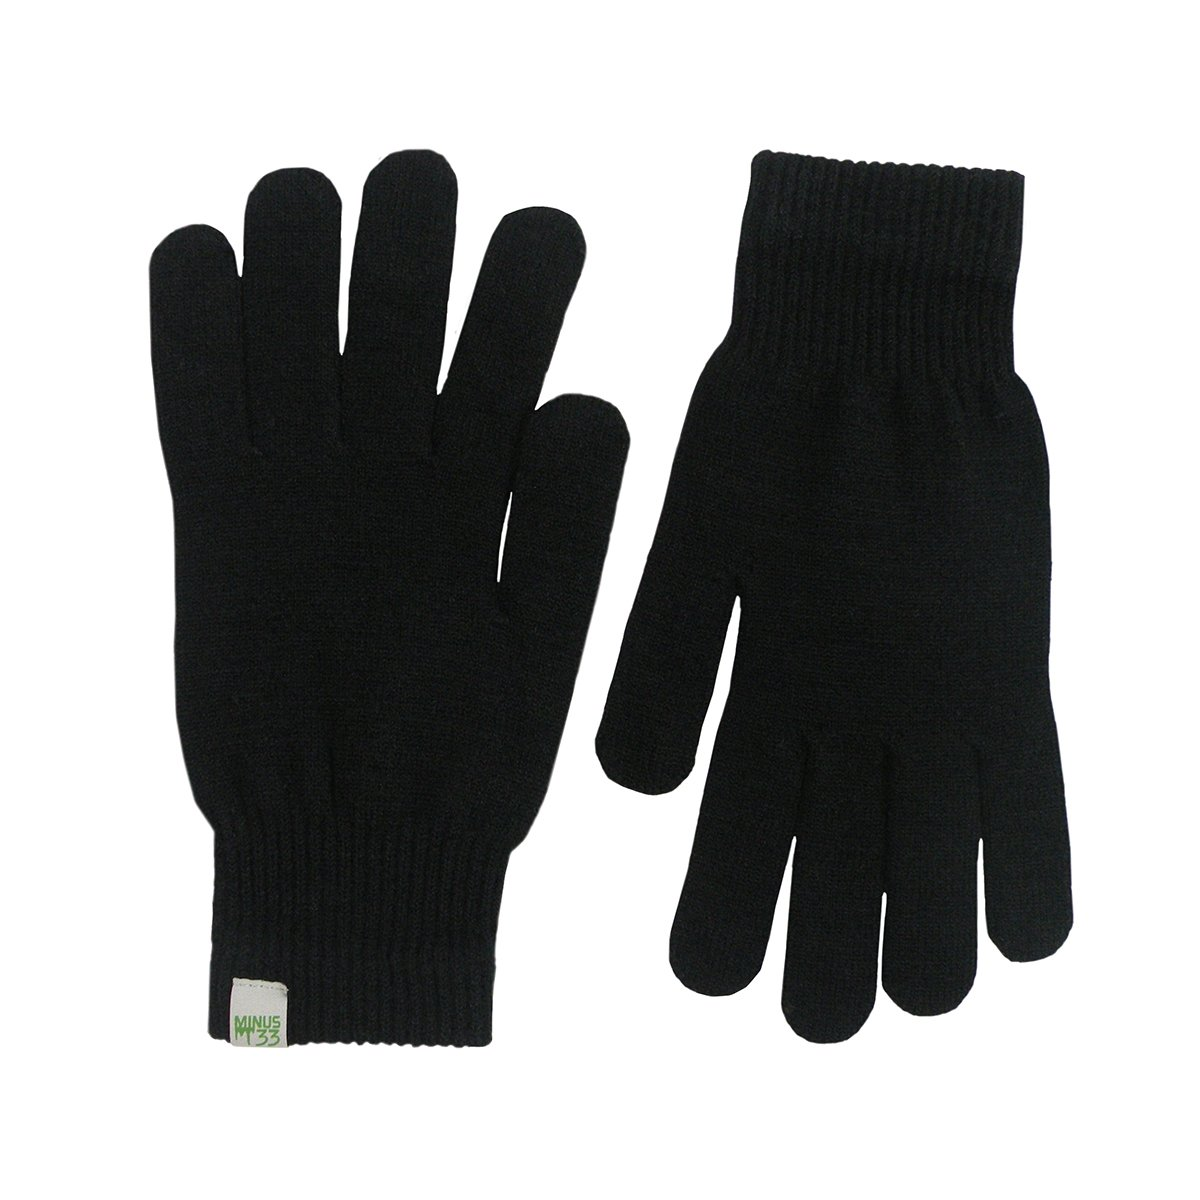 Minus33 Merino Wool Glove Liner Black, Black, Large